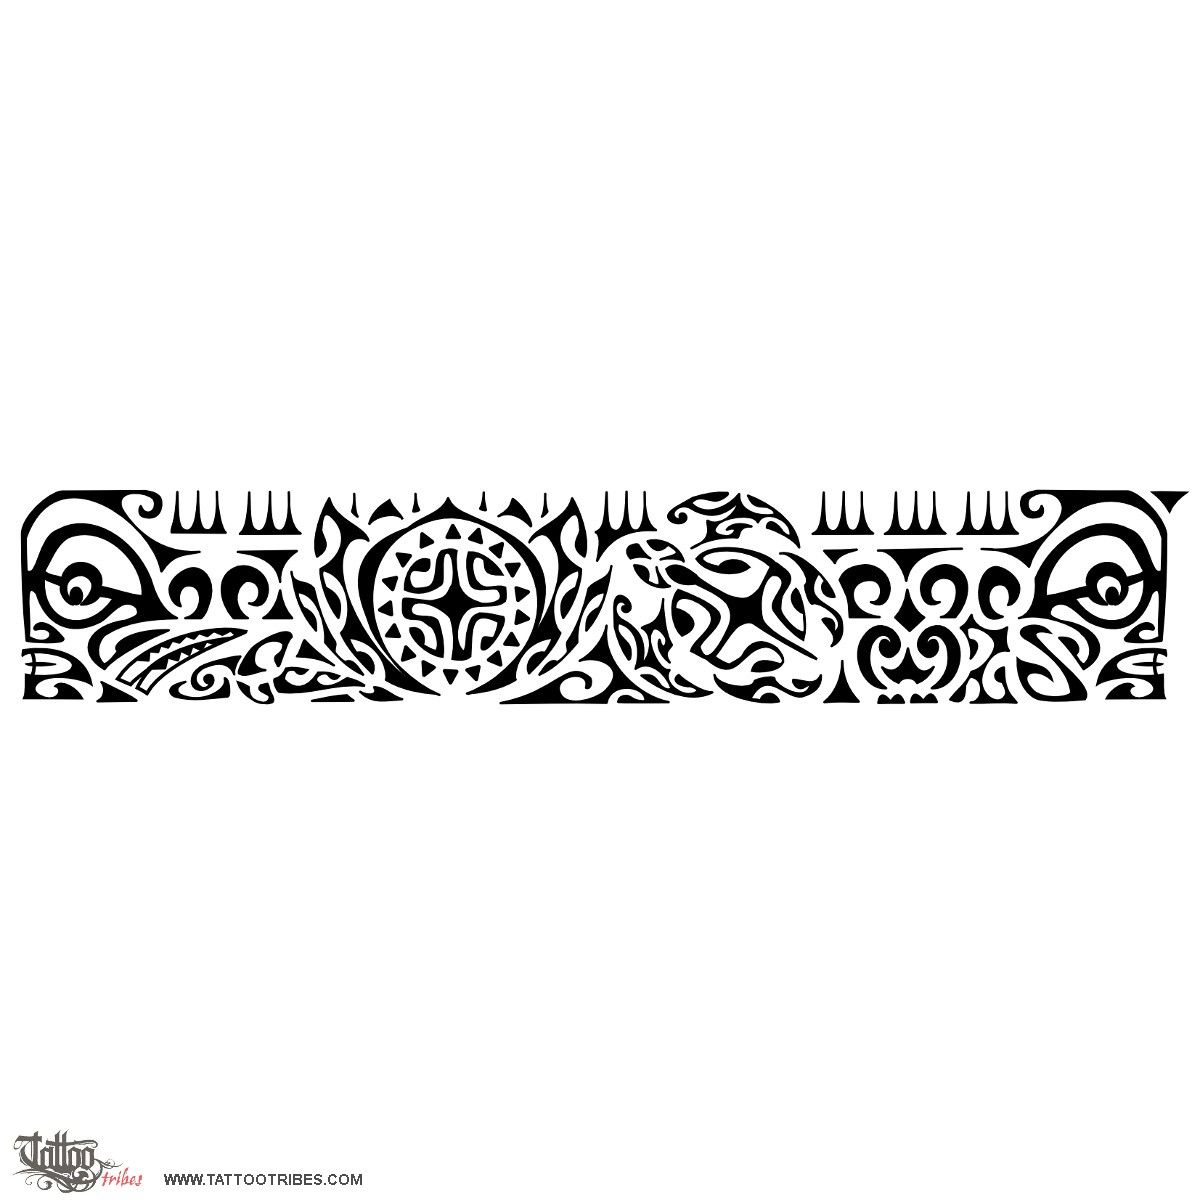 Black Ink Polynesin Armband Tattoo Design And Information